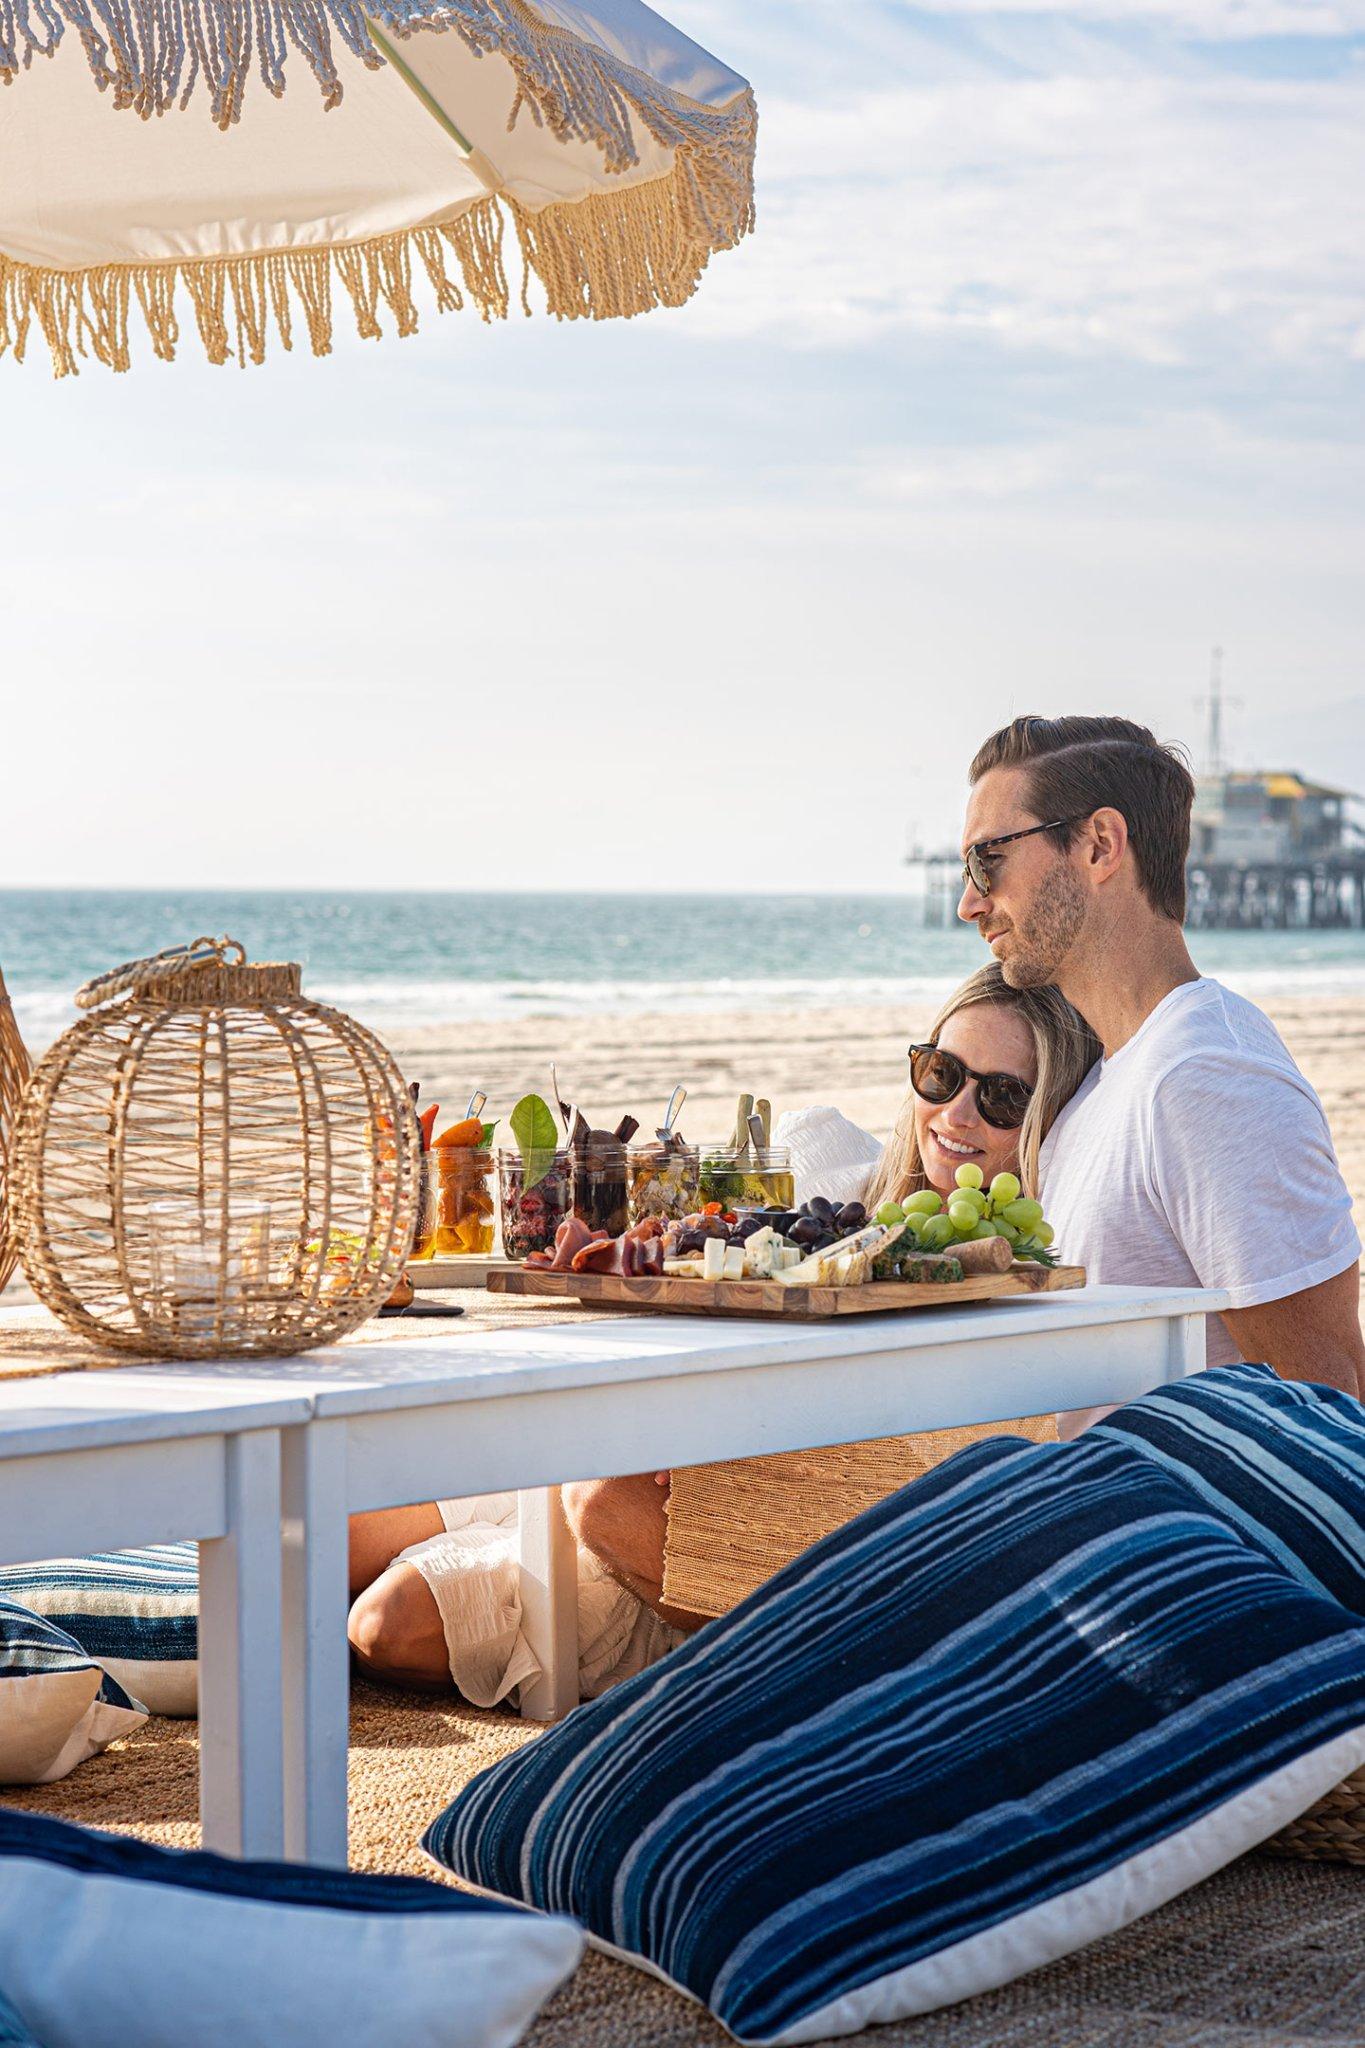 The Ultimate Santa Monica Staycation